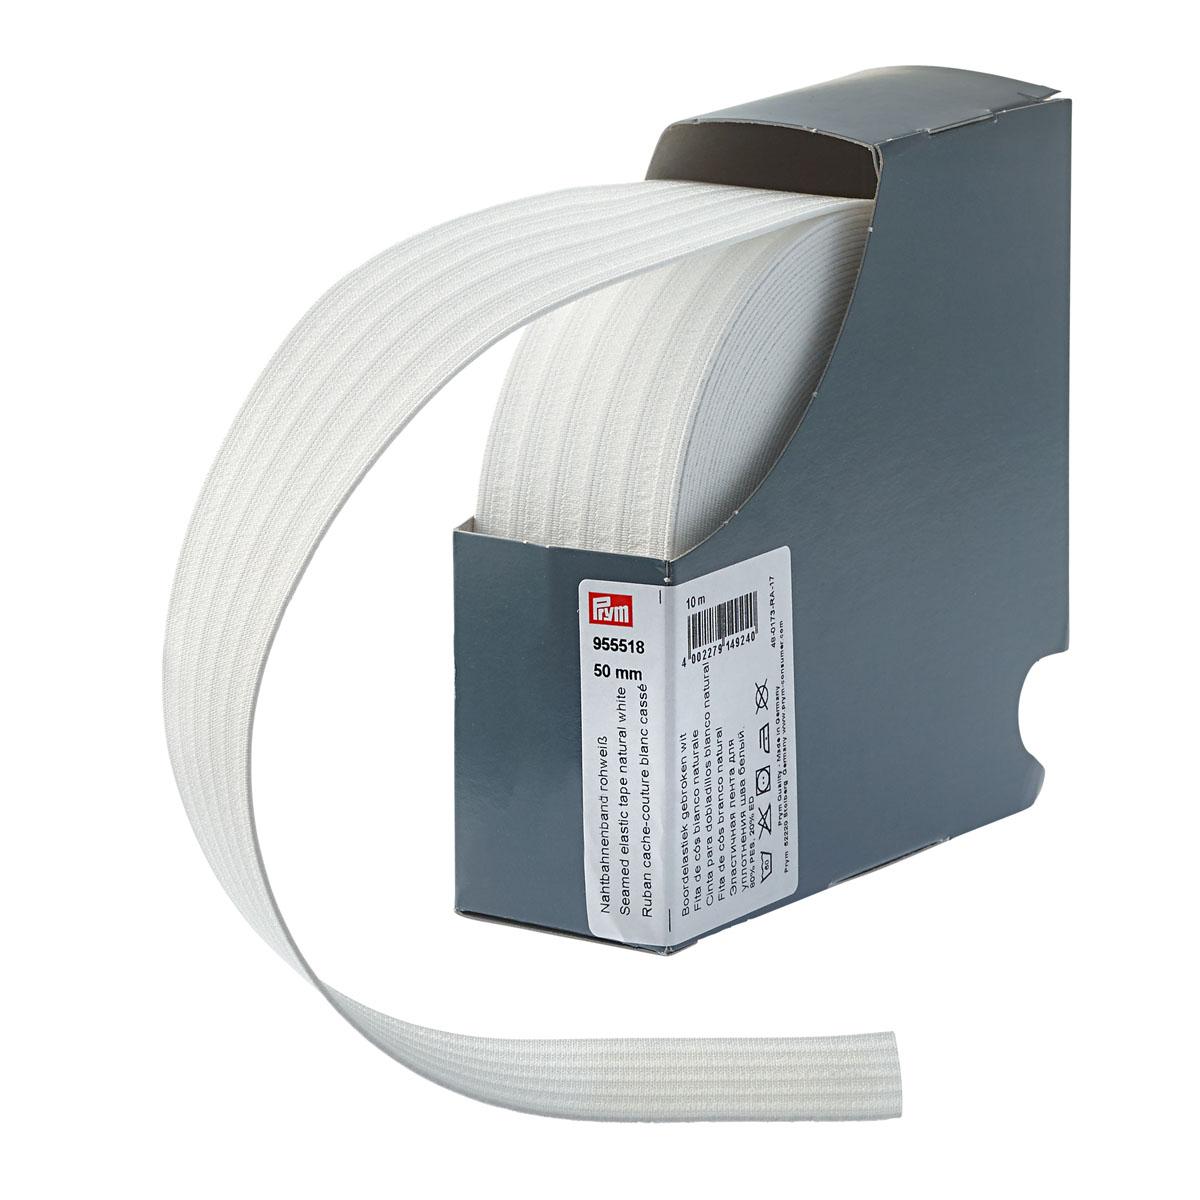 955518 Эластичная лента для уплотнения шва 50мм*10м белый, натуральный цв. Prym